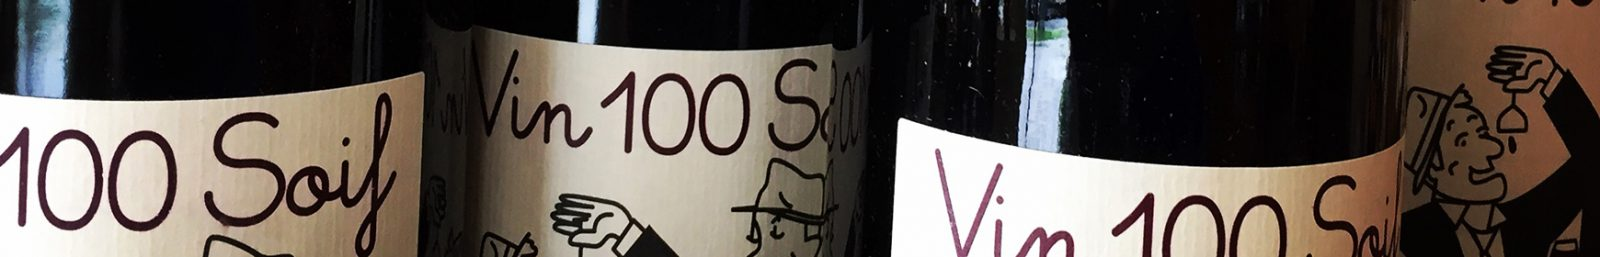 Vin 100 Soif